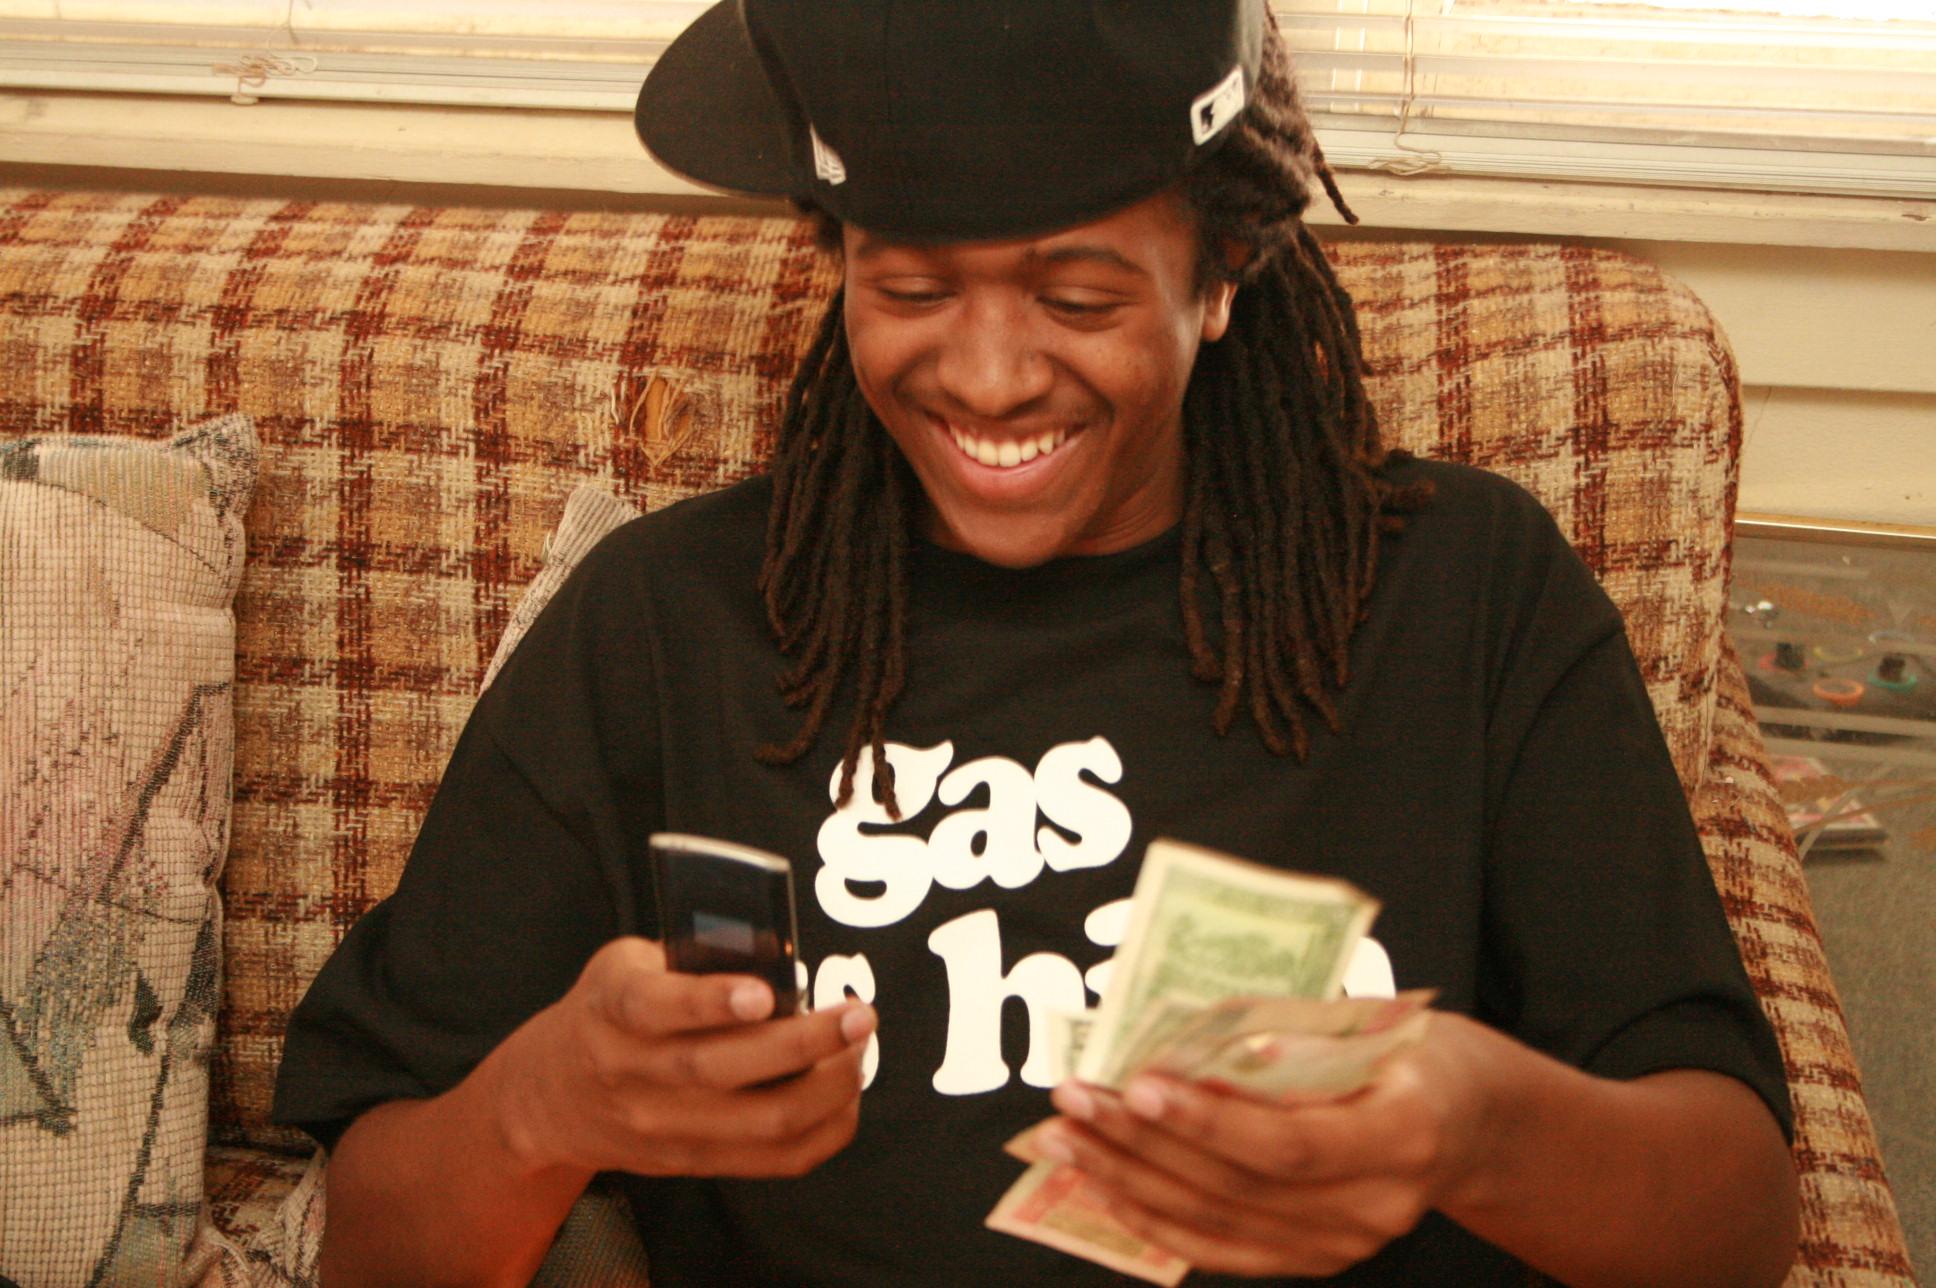 Money on Line 1